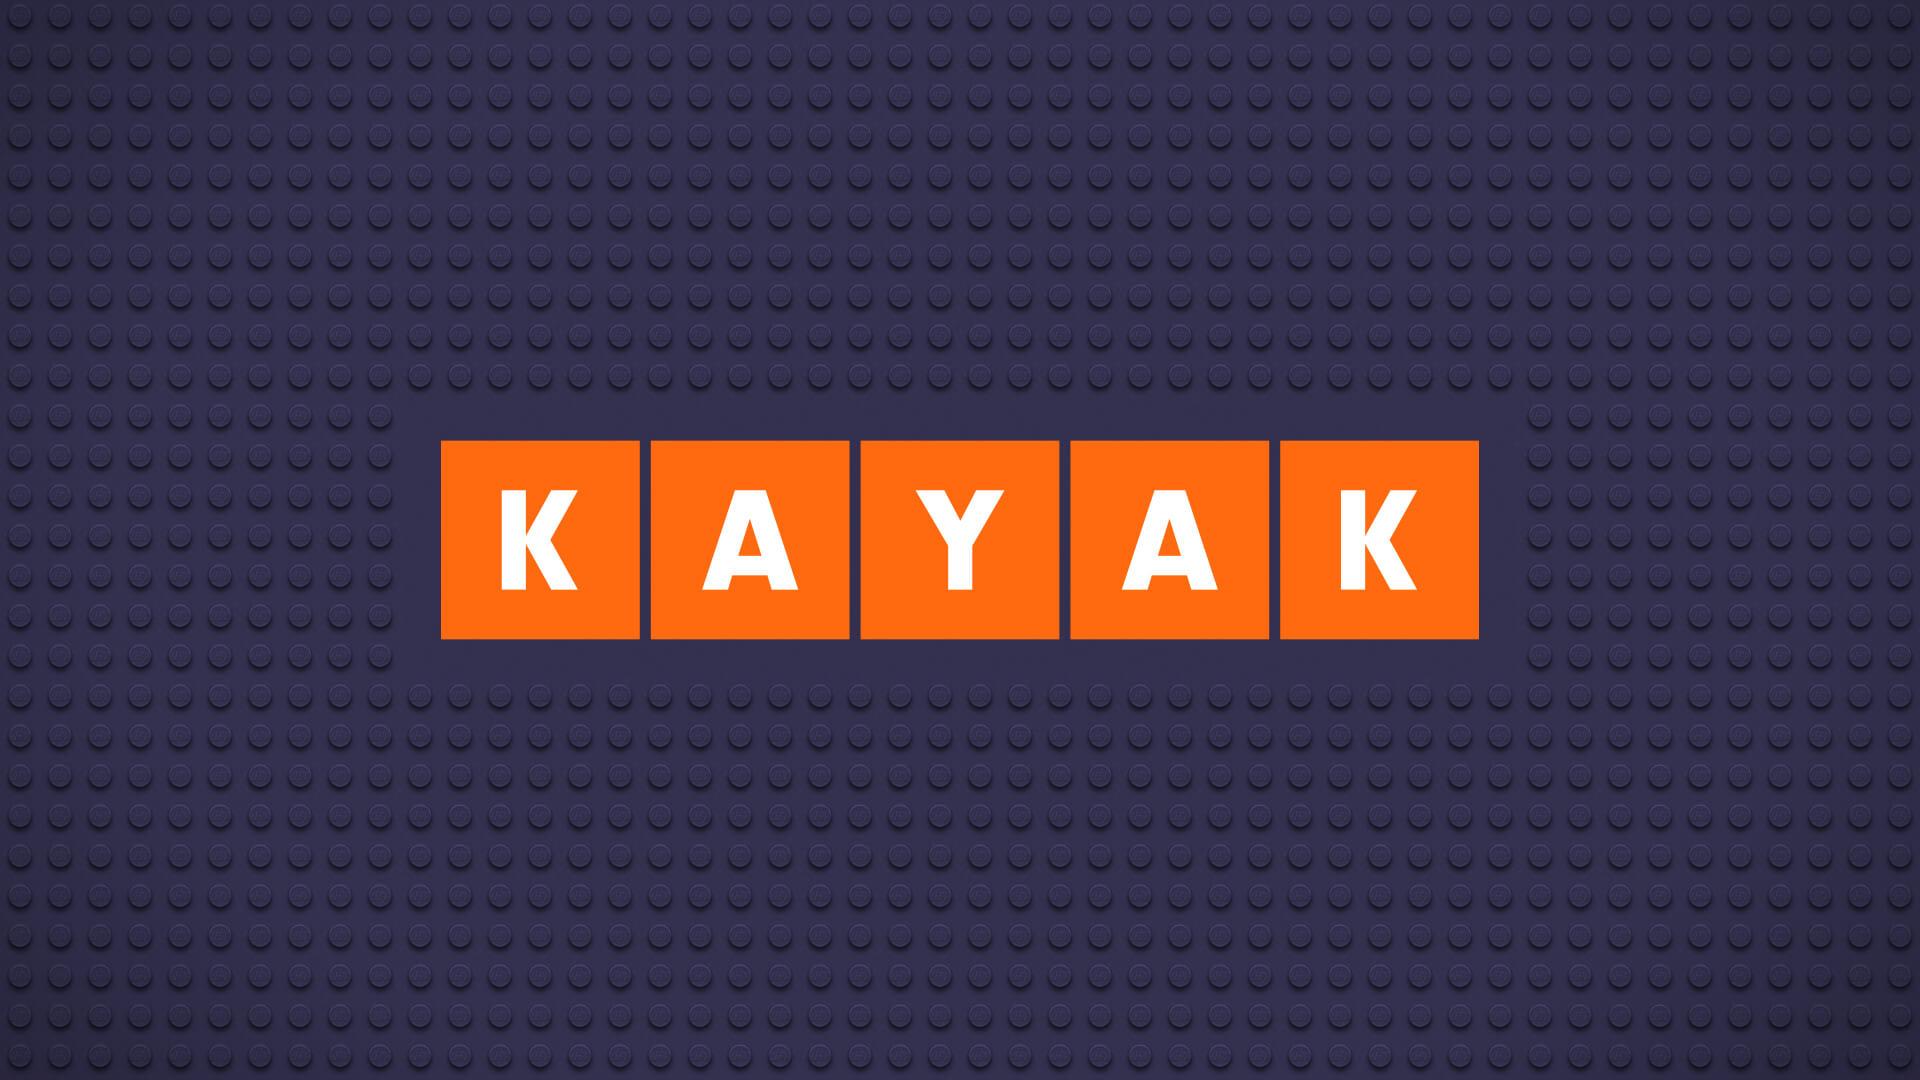 KAYAK Design System